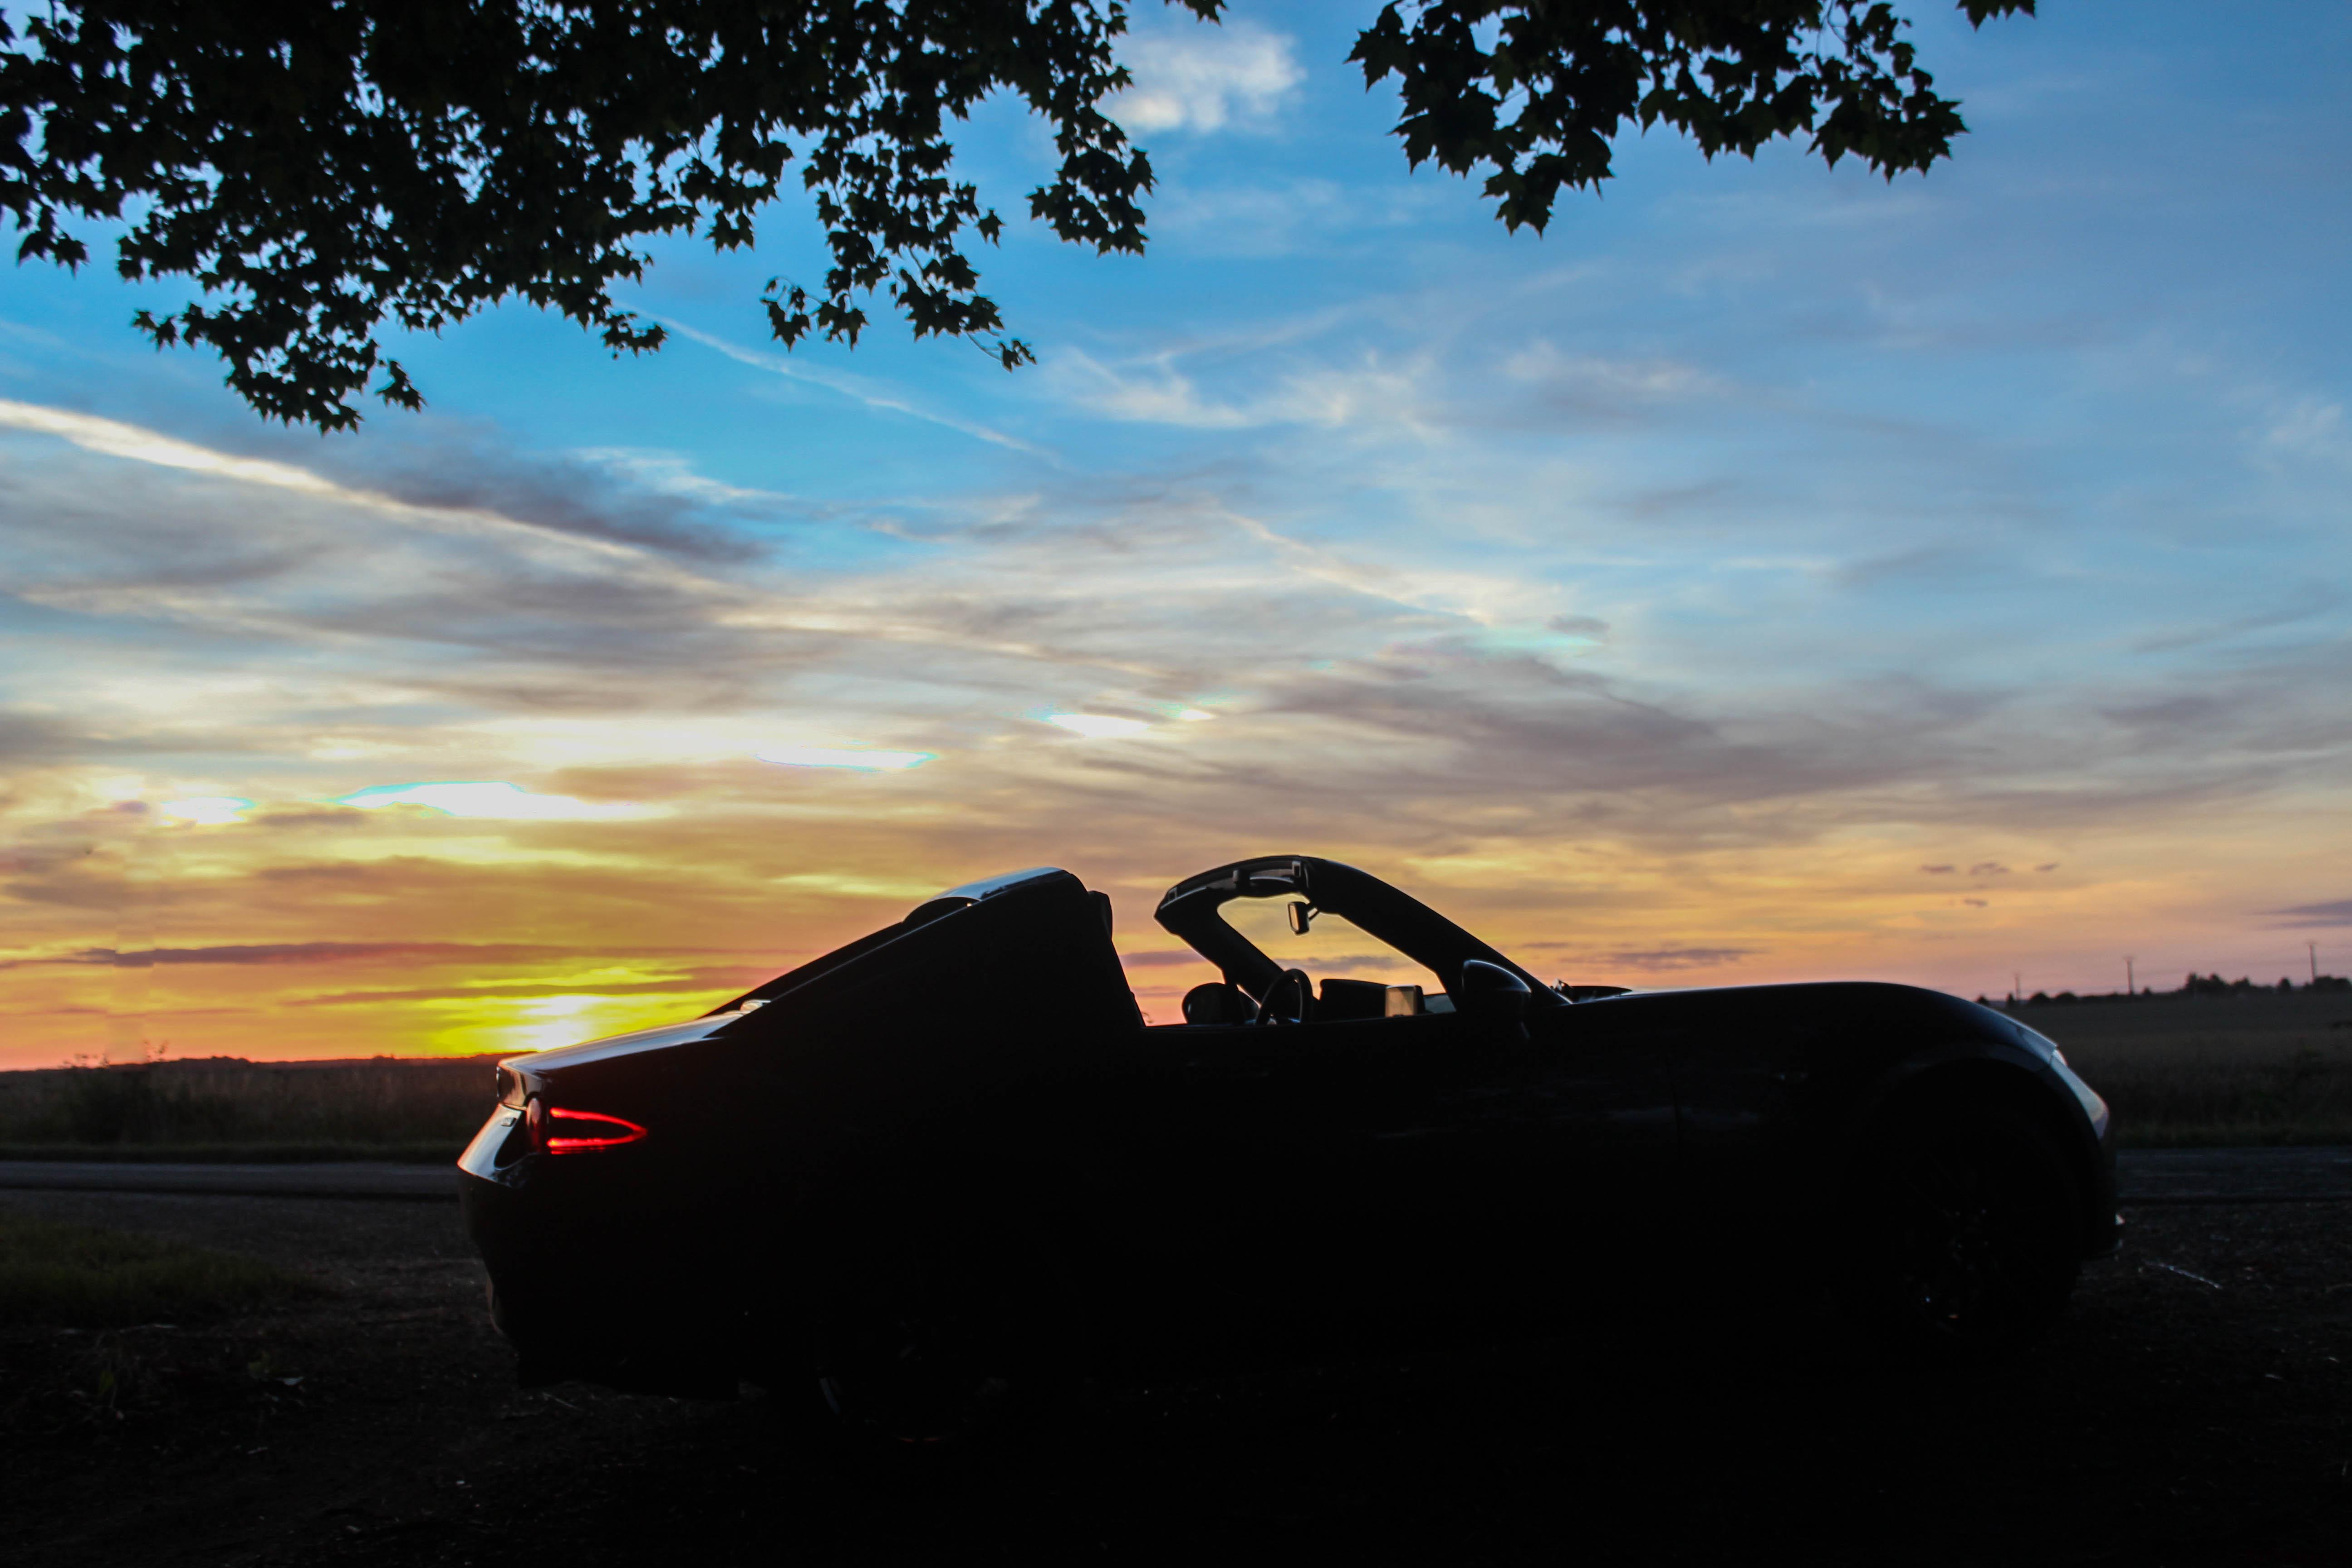 MazdaMX5RF13-mazda-mx5-rf-edition-profil-side-Arnaud Demasier-RSPhotographie